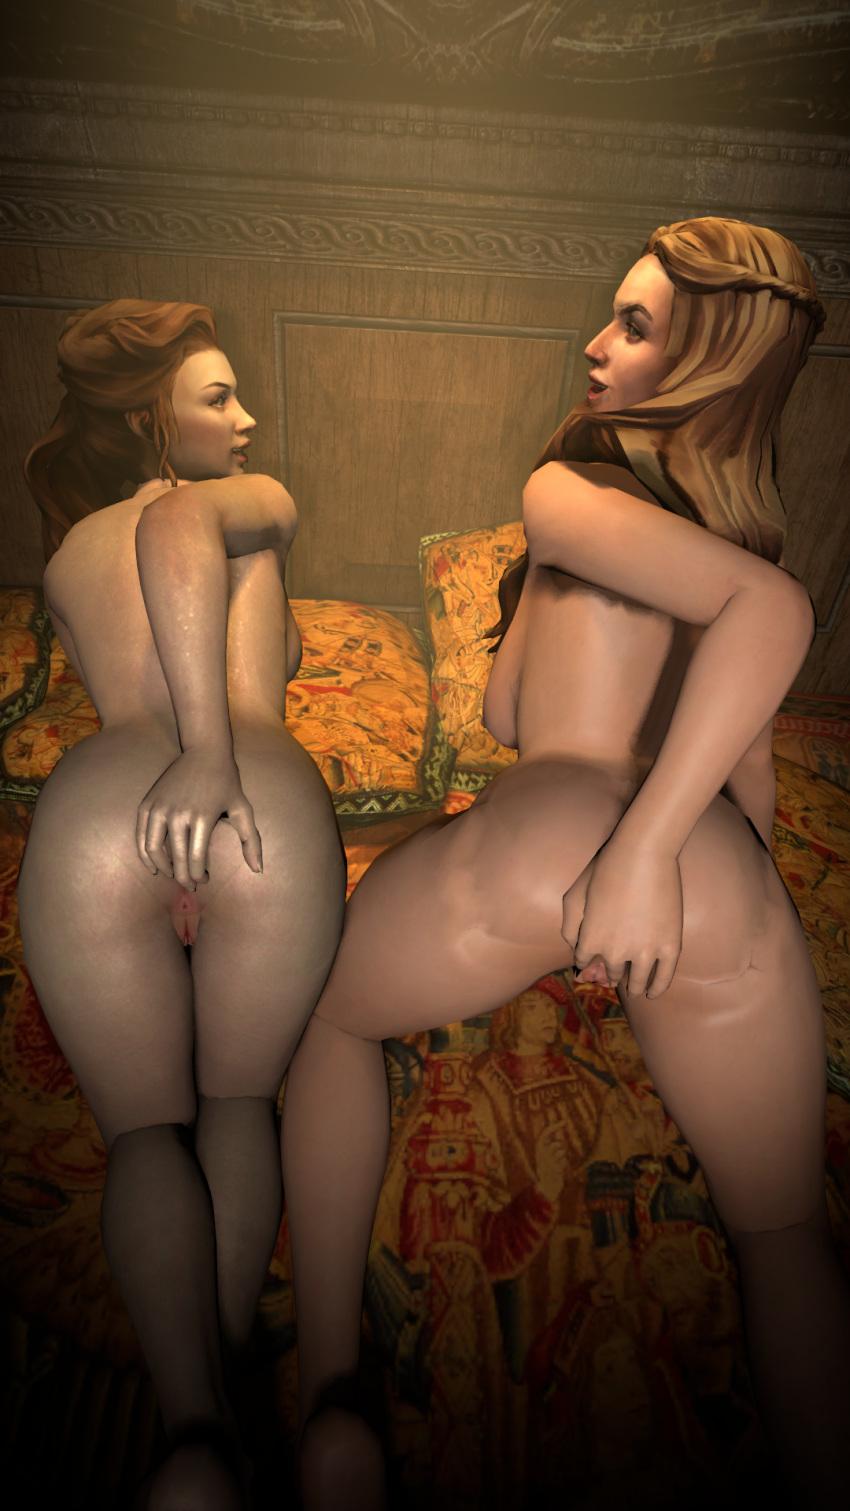 nude of thrones ygritte game Angel dust hazbin hotel fanart